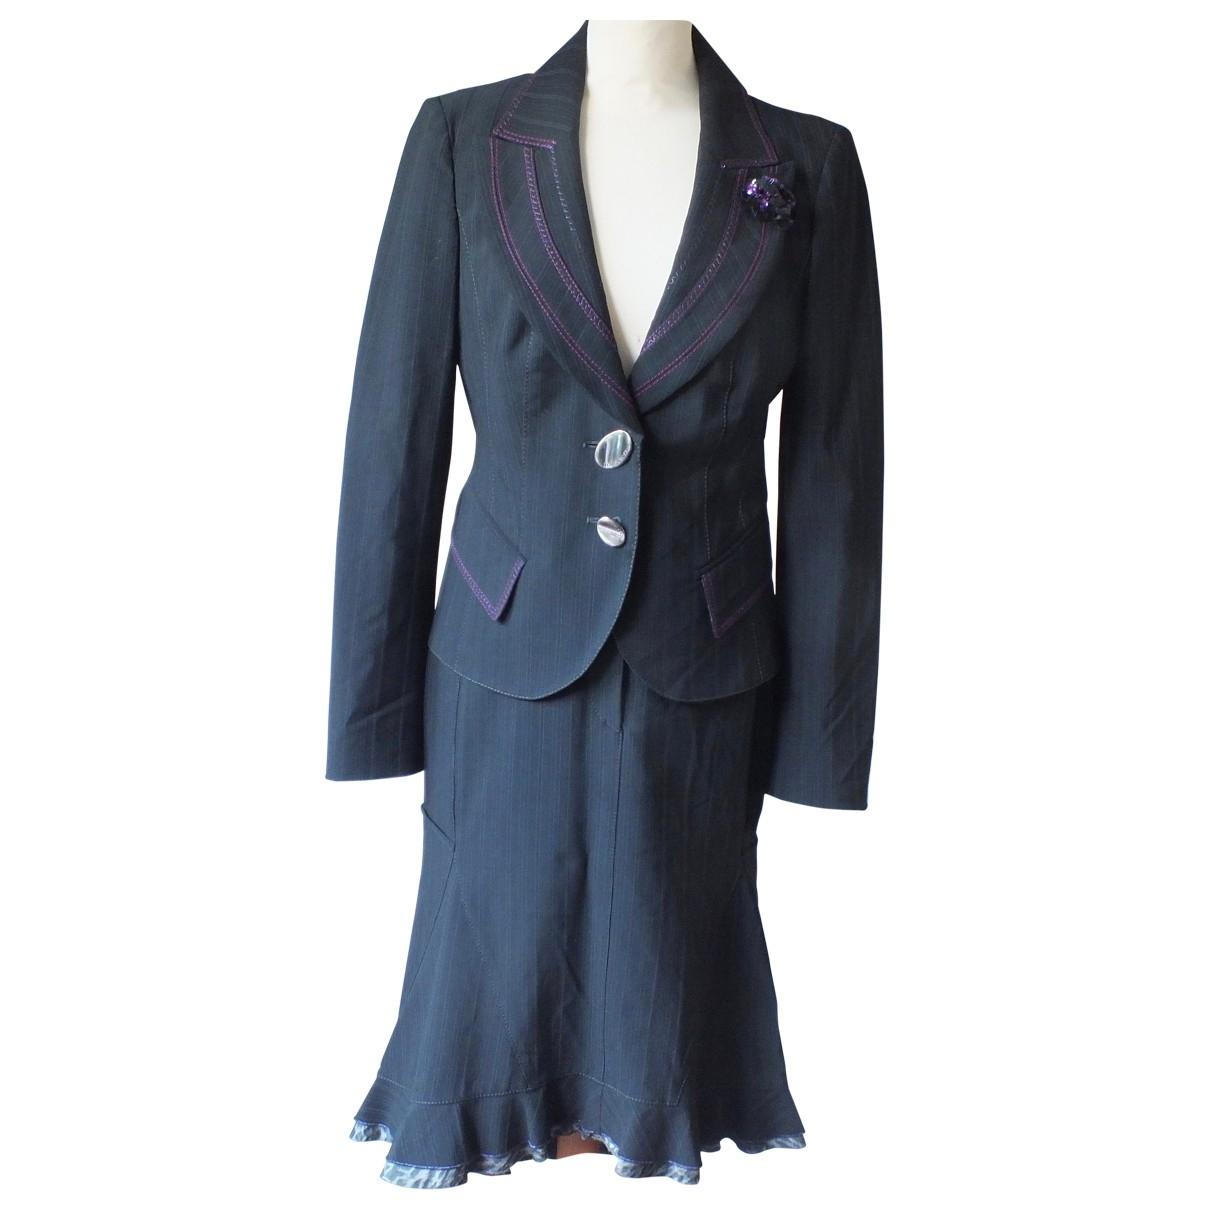 Maria Grazia Severi \N Black Wool jacket for Women 10 UK